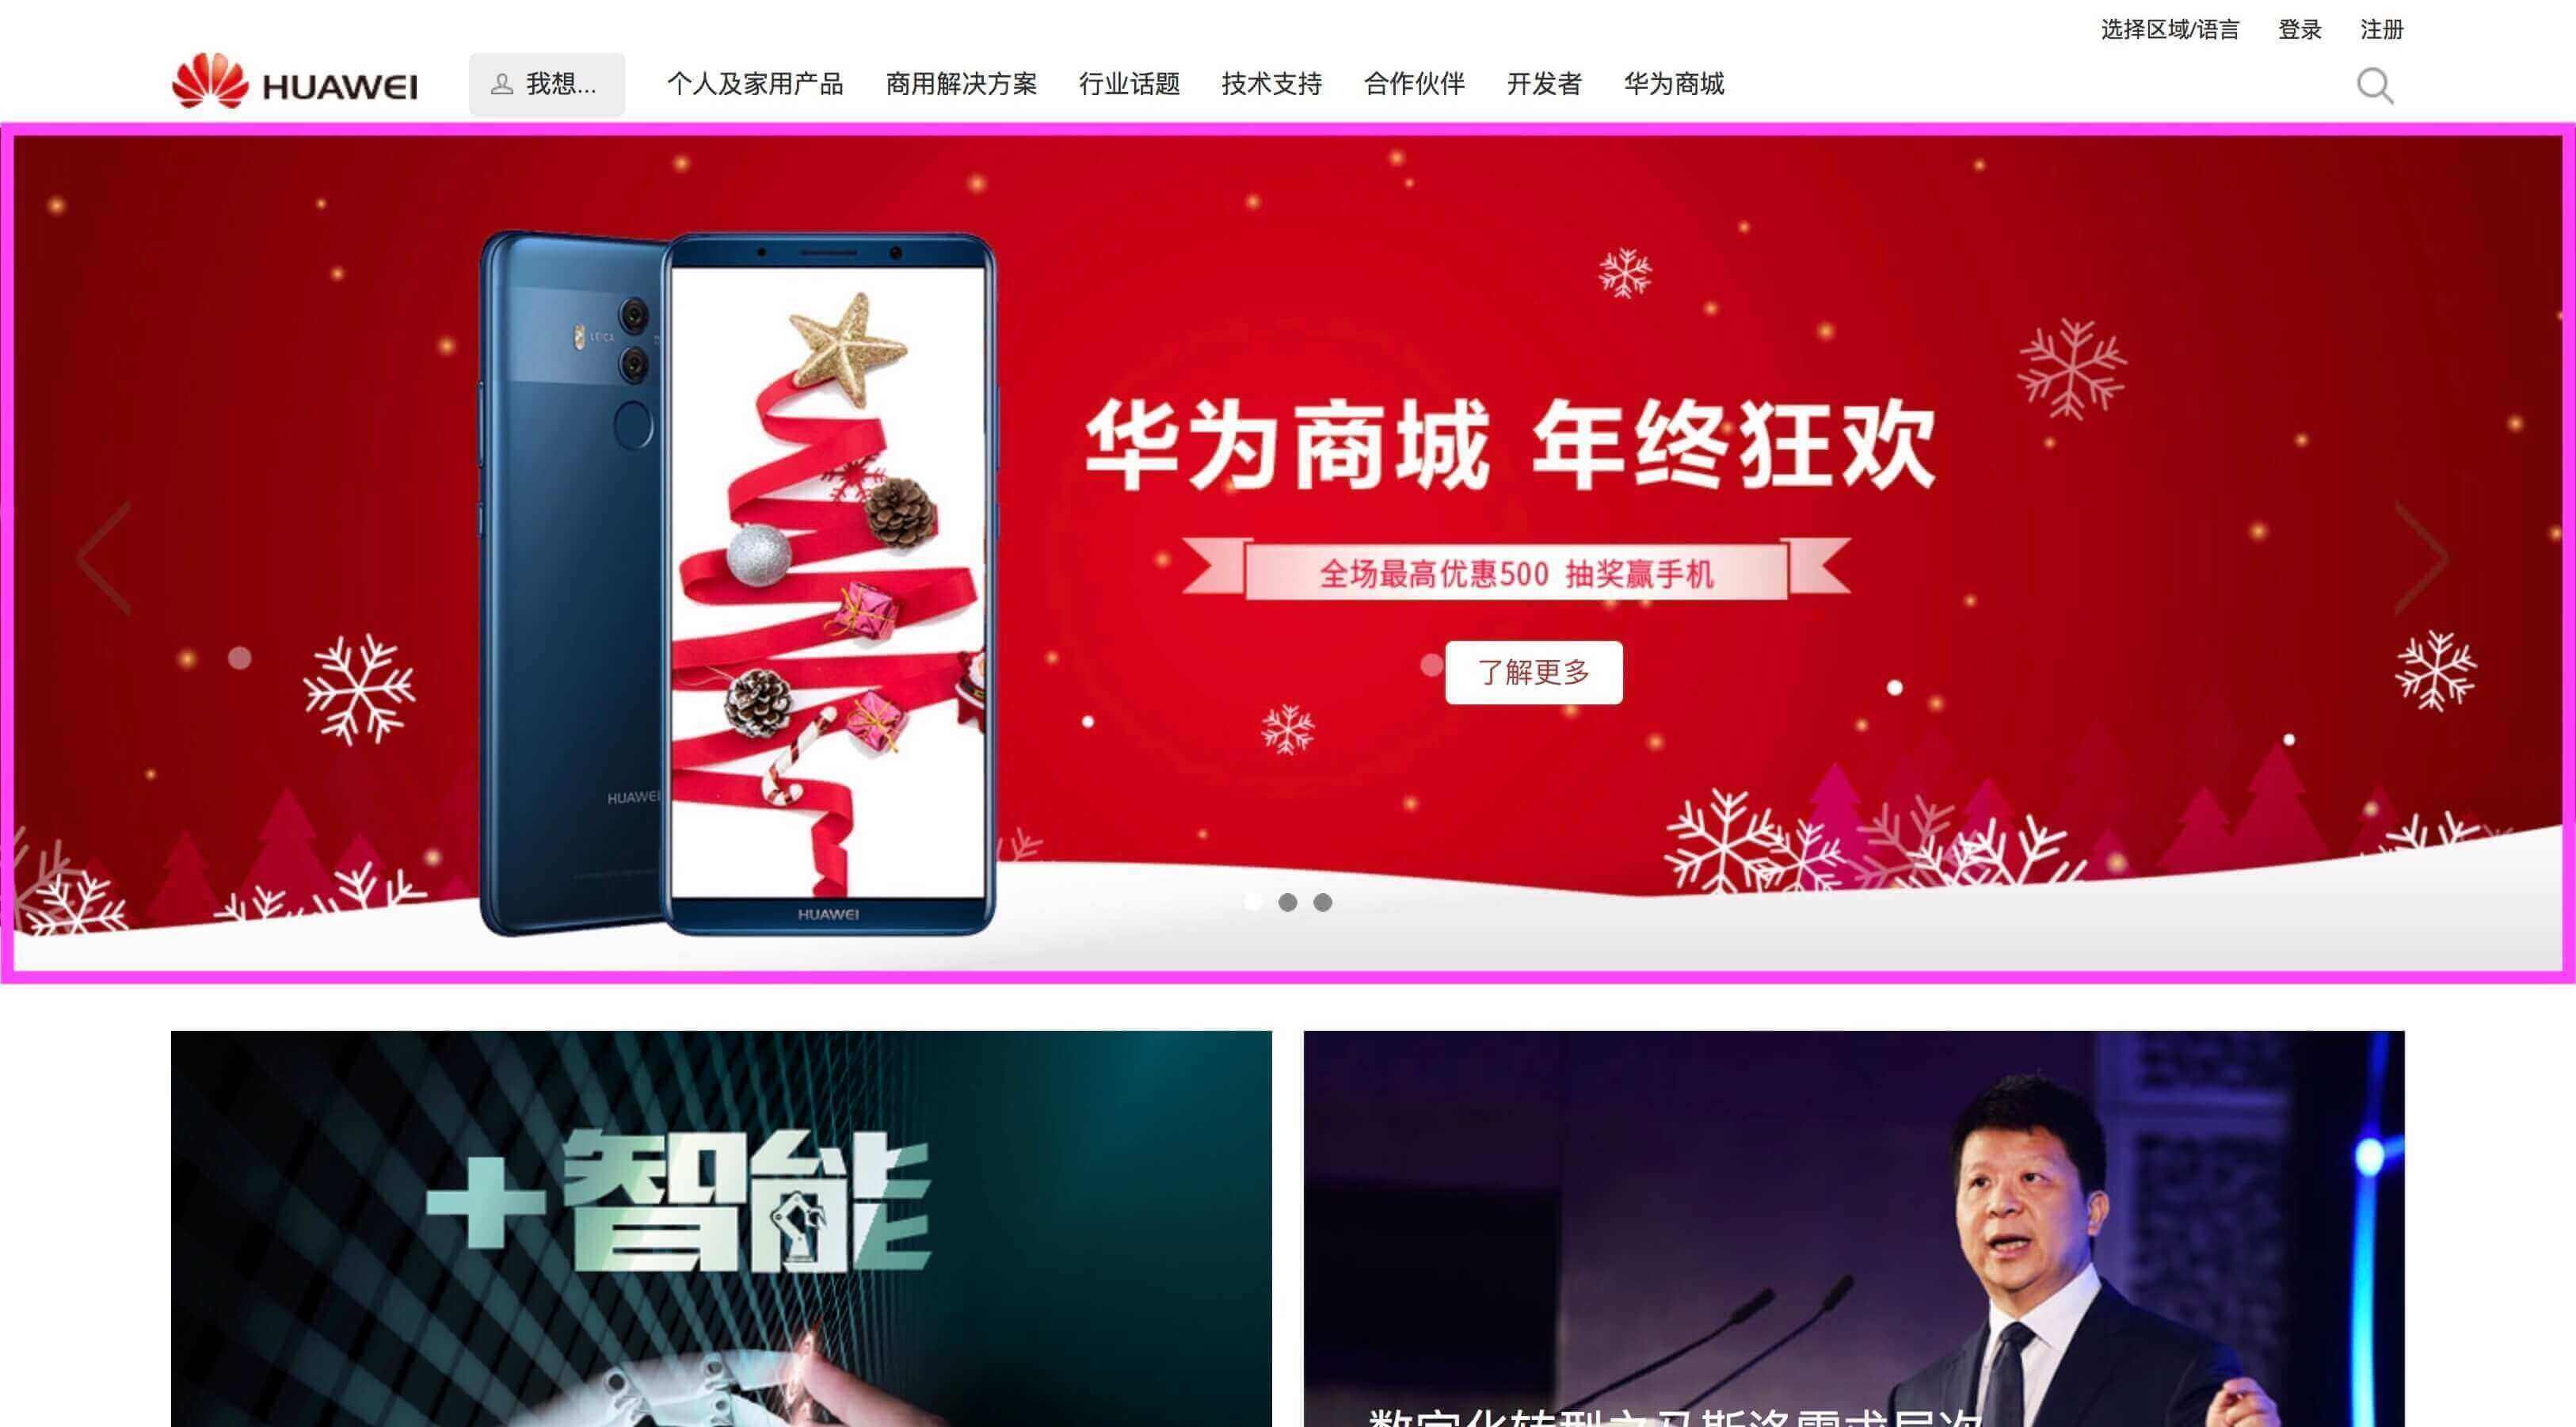 Huawei homepage design